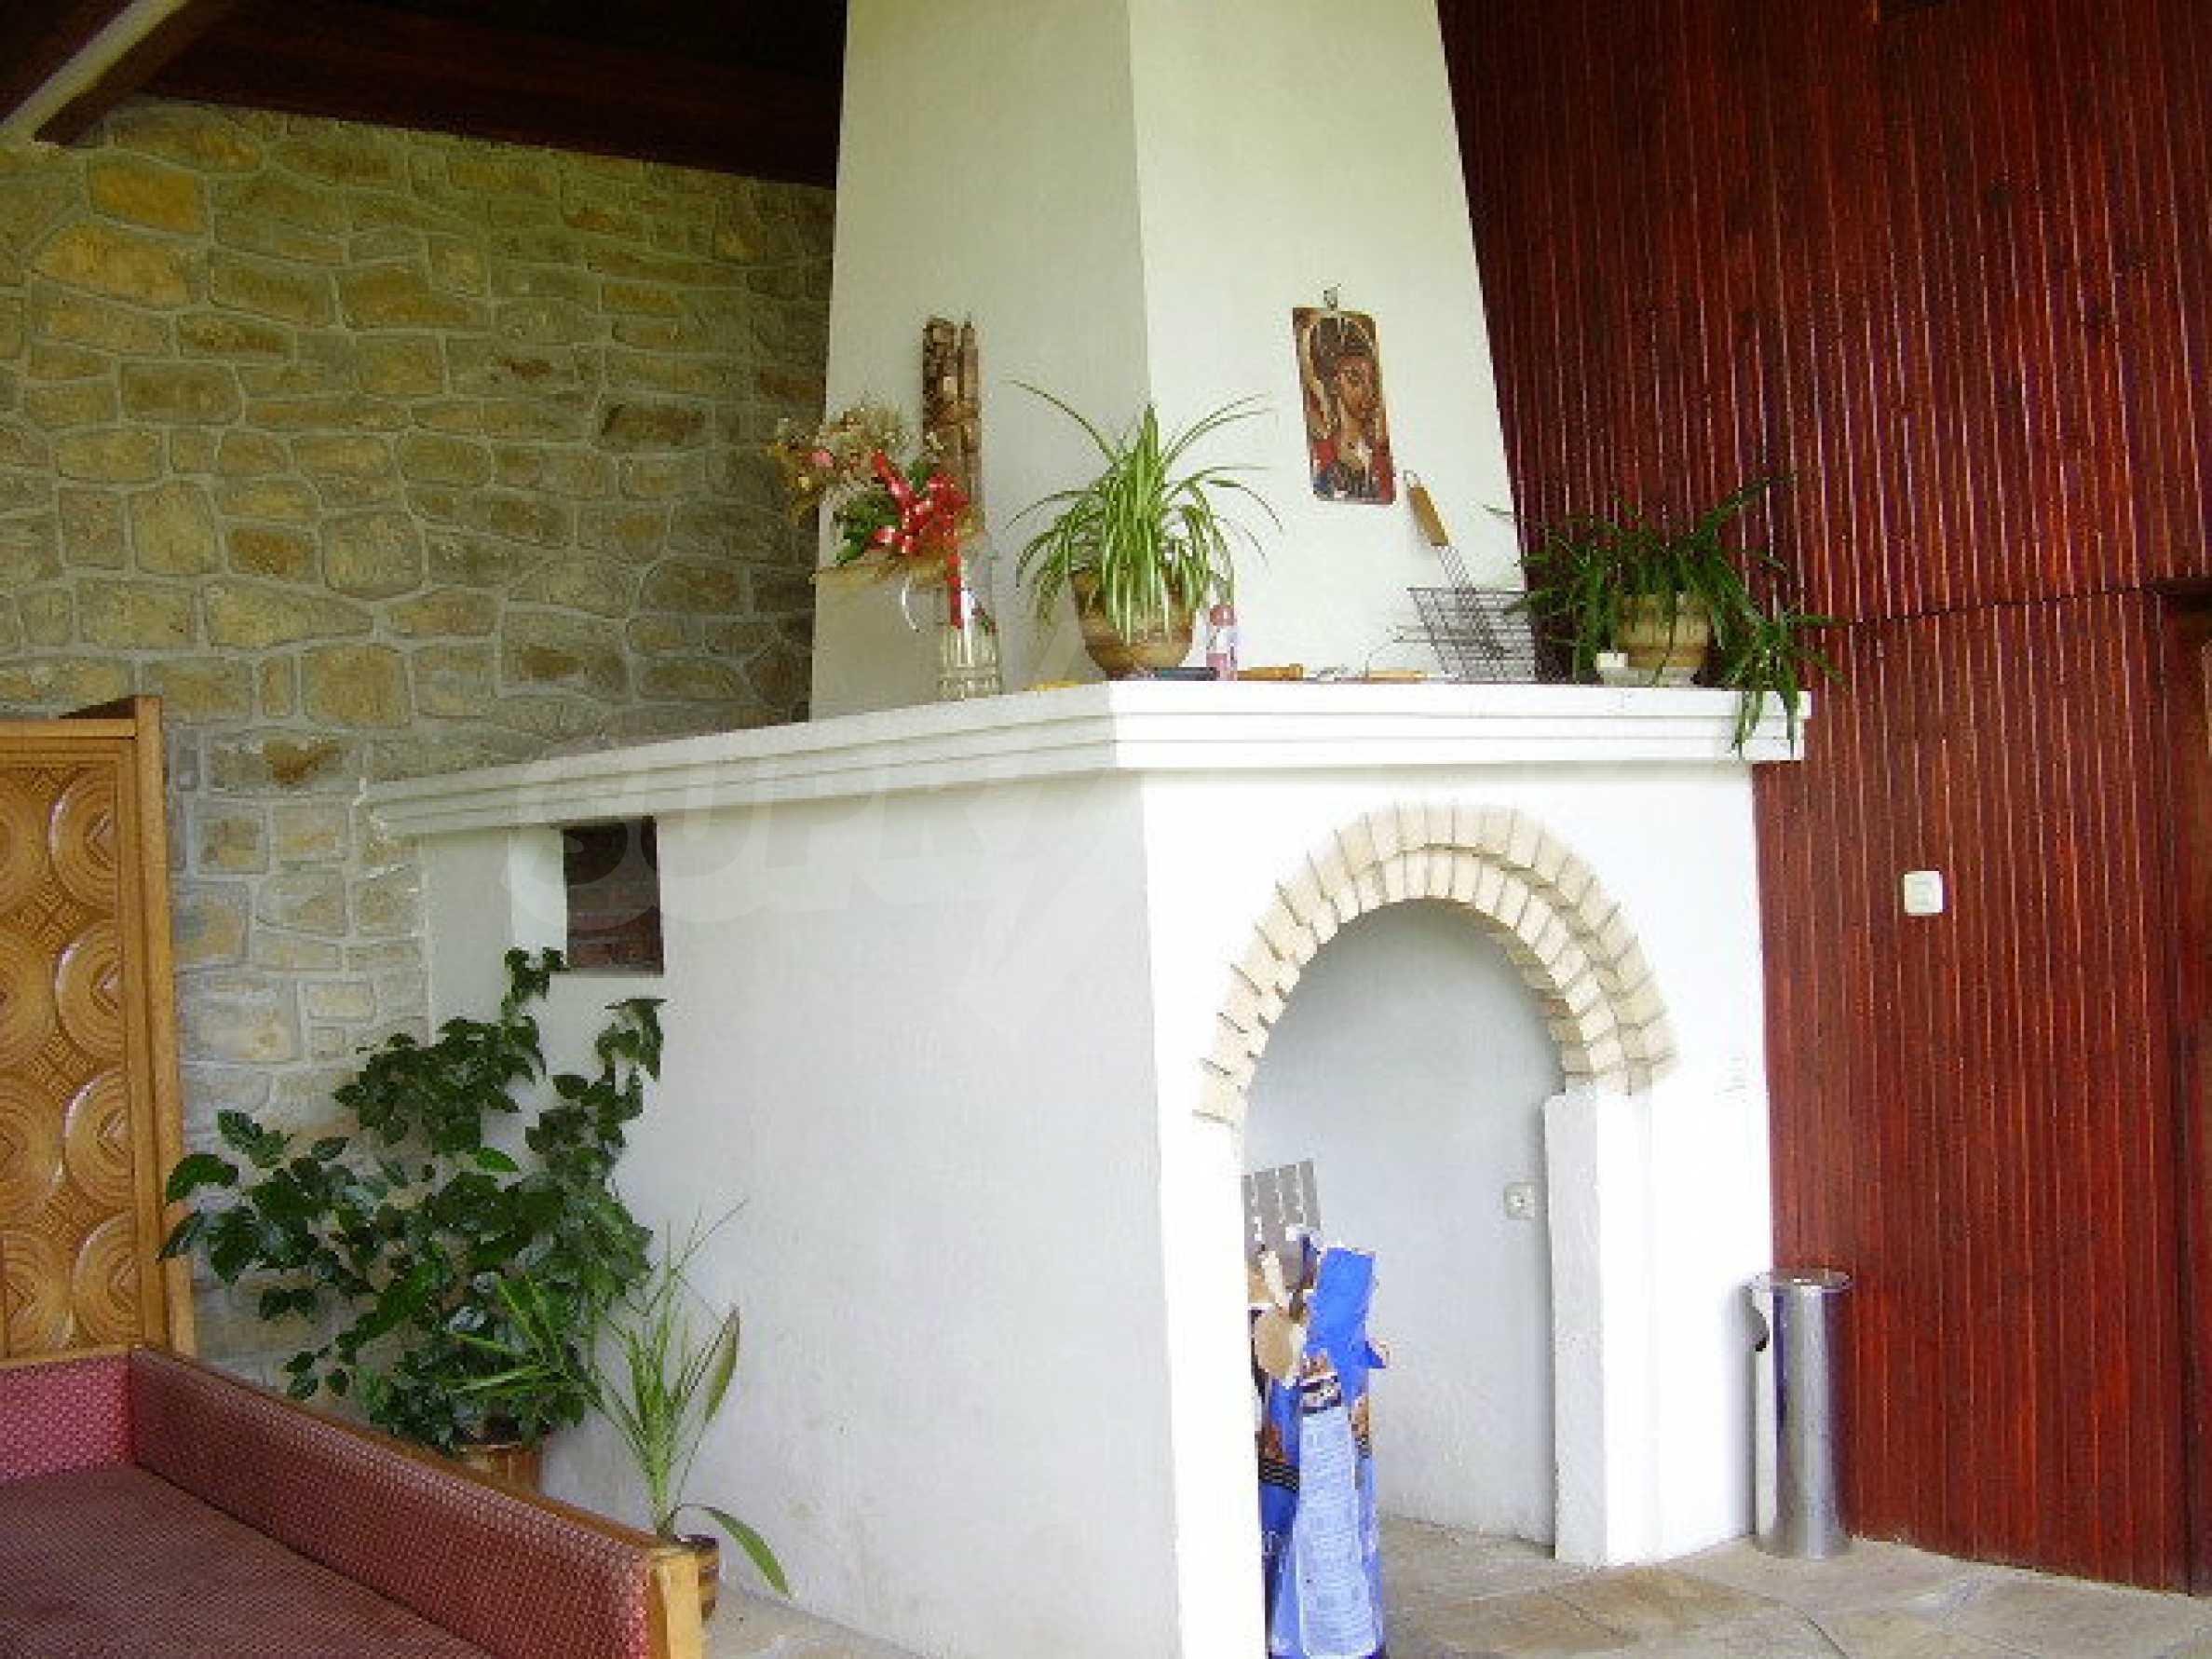 Renoviertes Haus nur 3 km von Veliko Tarnovo entfernt 8